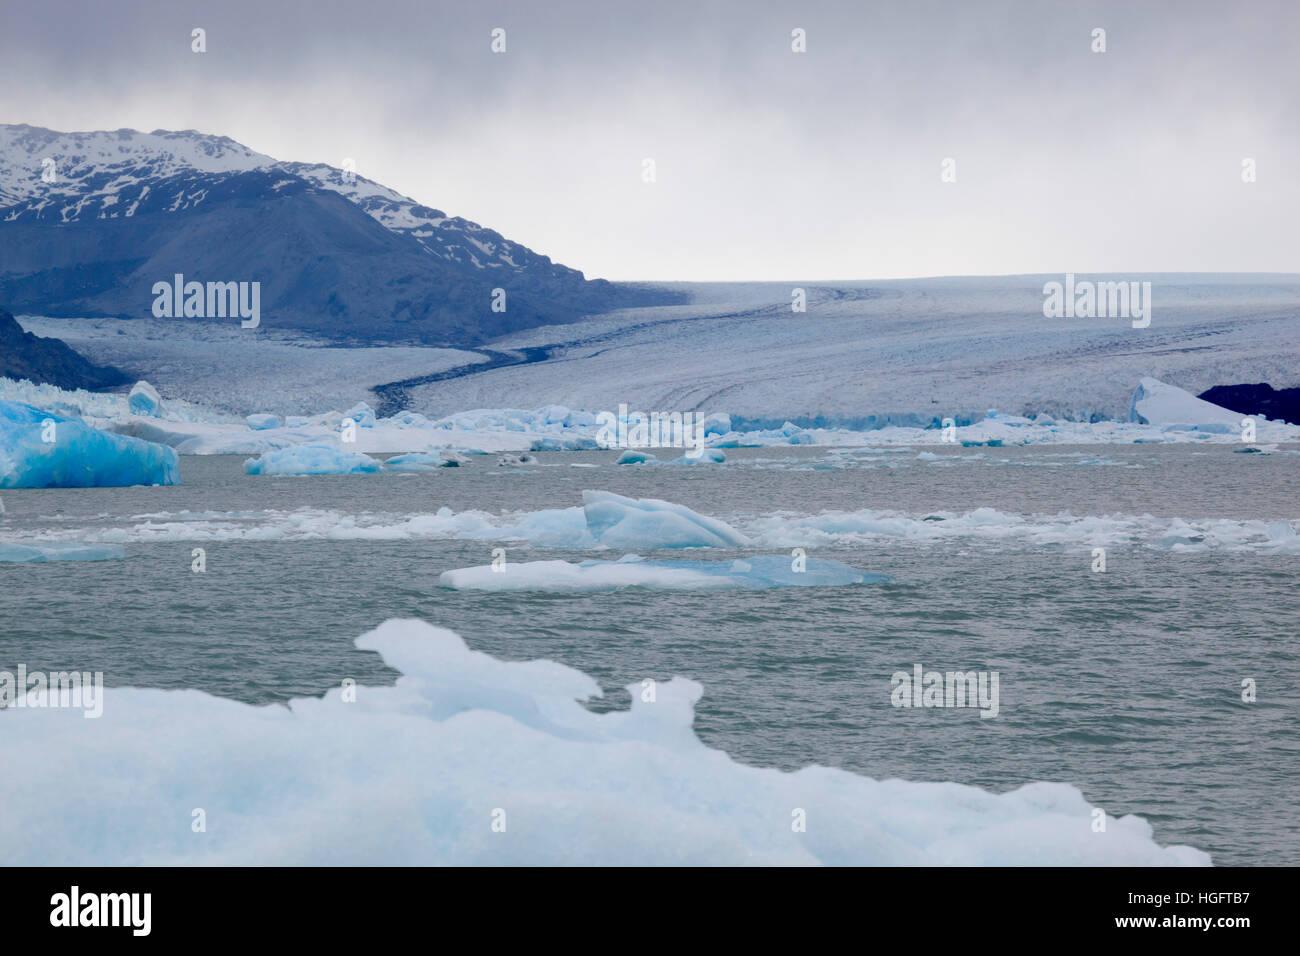 Il Ghiacciaio Upsala e icebergs sul Lago Argentino, El Calafate, Parque Nacional Los Glaciares, Patagonia, Argentina, Immagini Stock